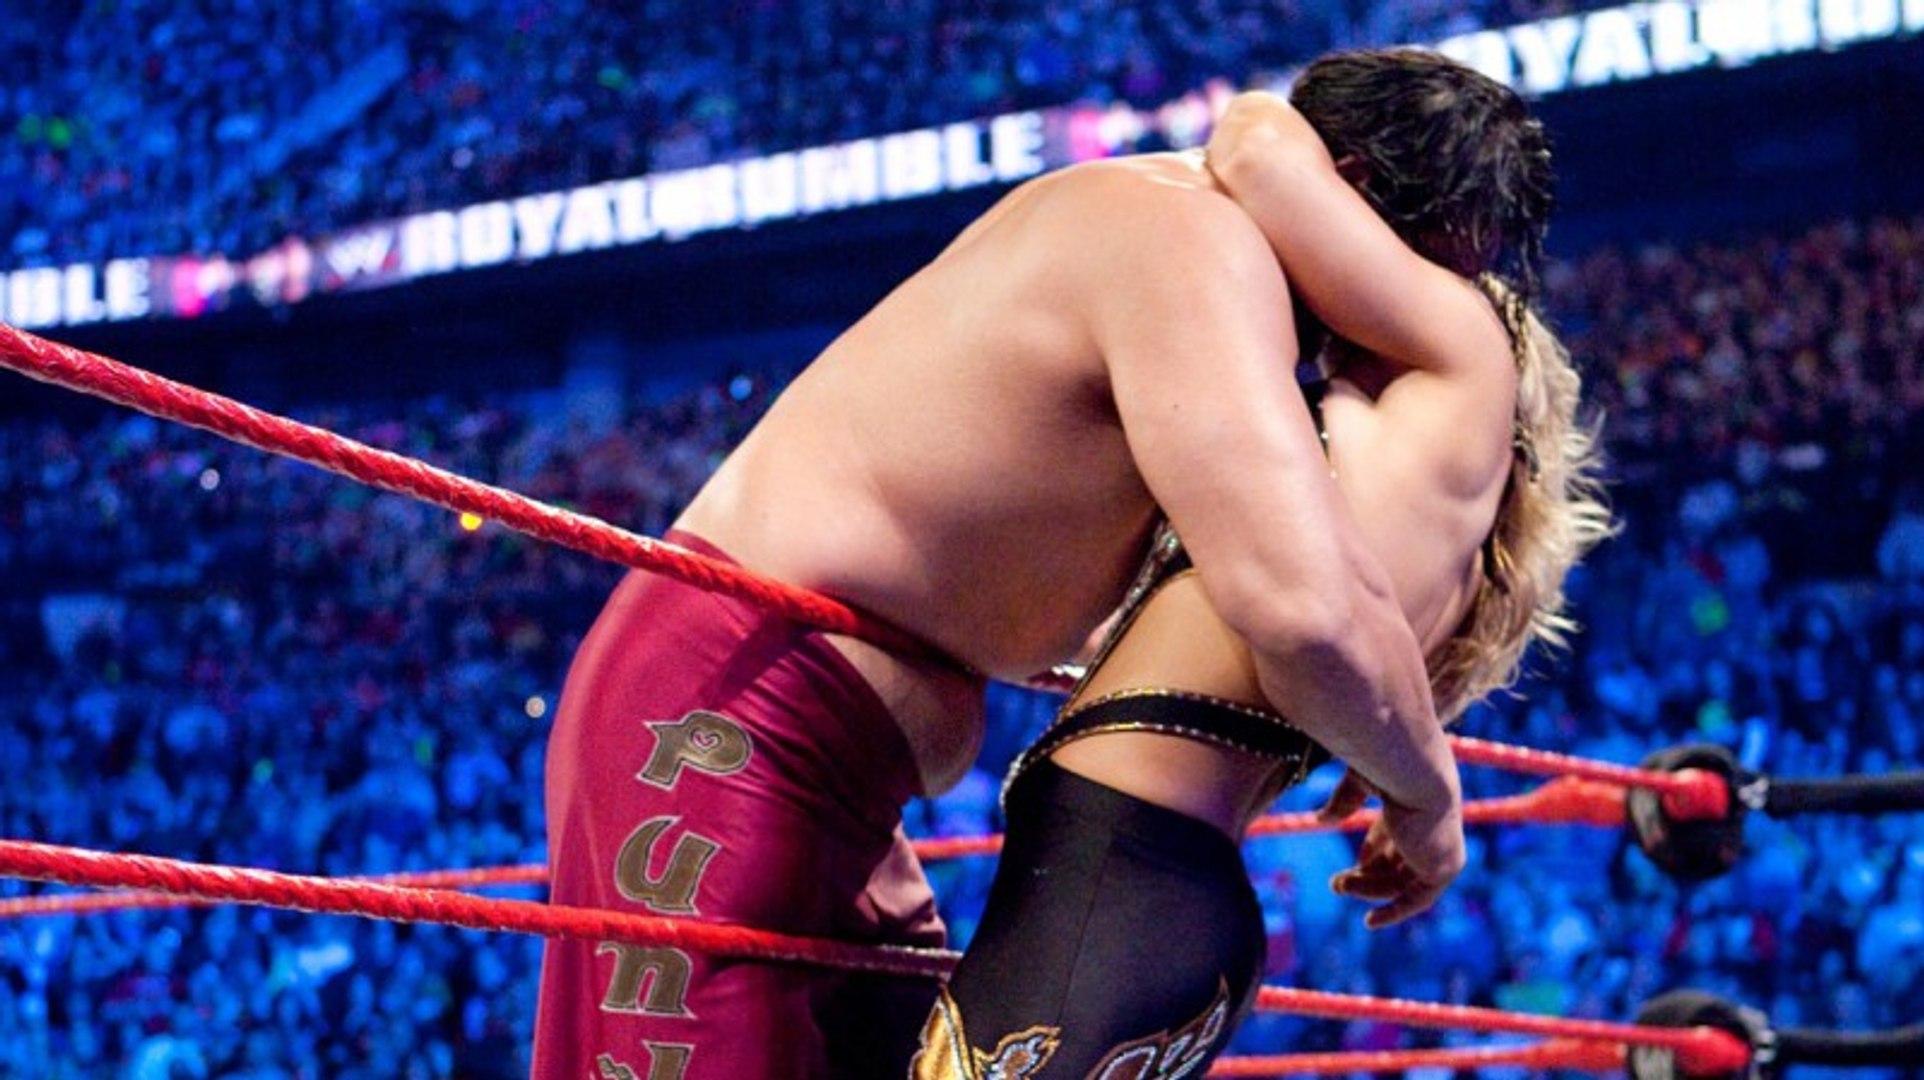 WWE Universe Hot High Impact Kiss | Hot Diva Kiss | Top Kiss In WWE | Love Moments In WWE